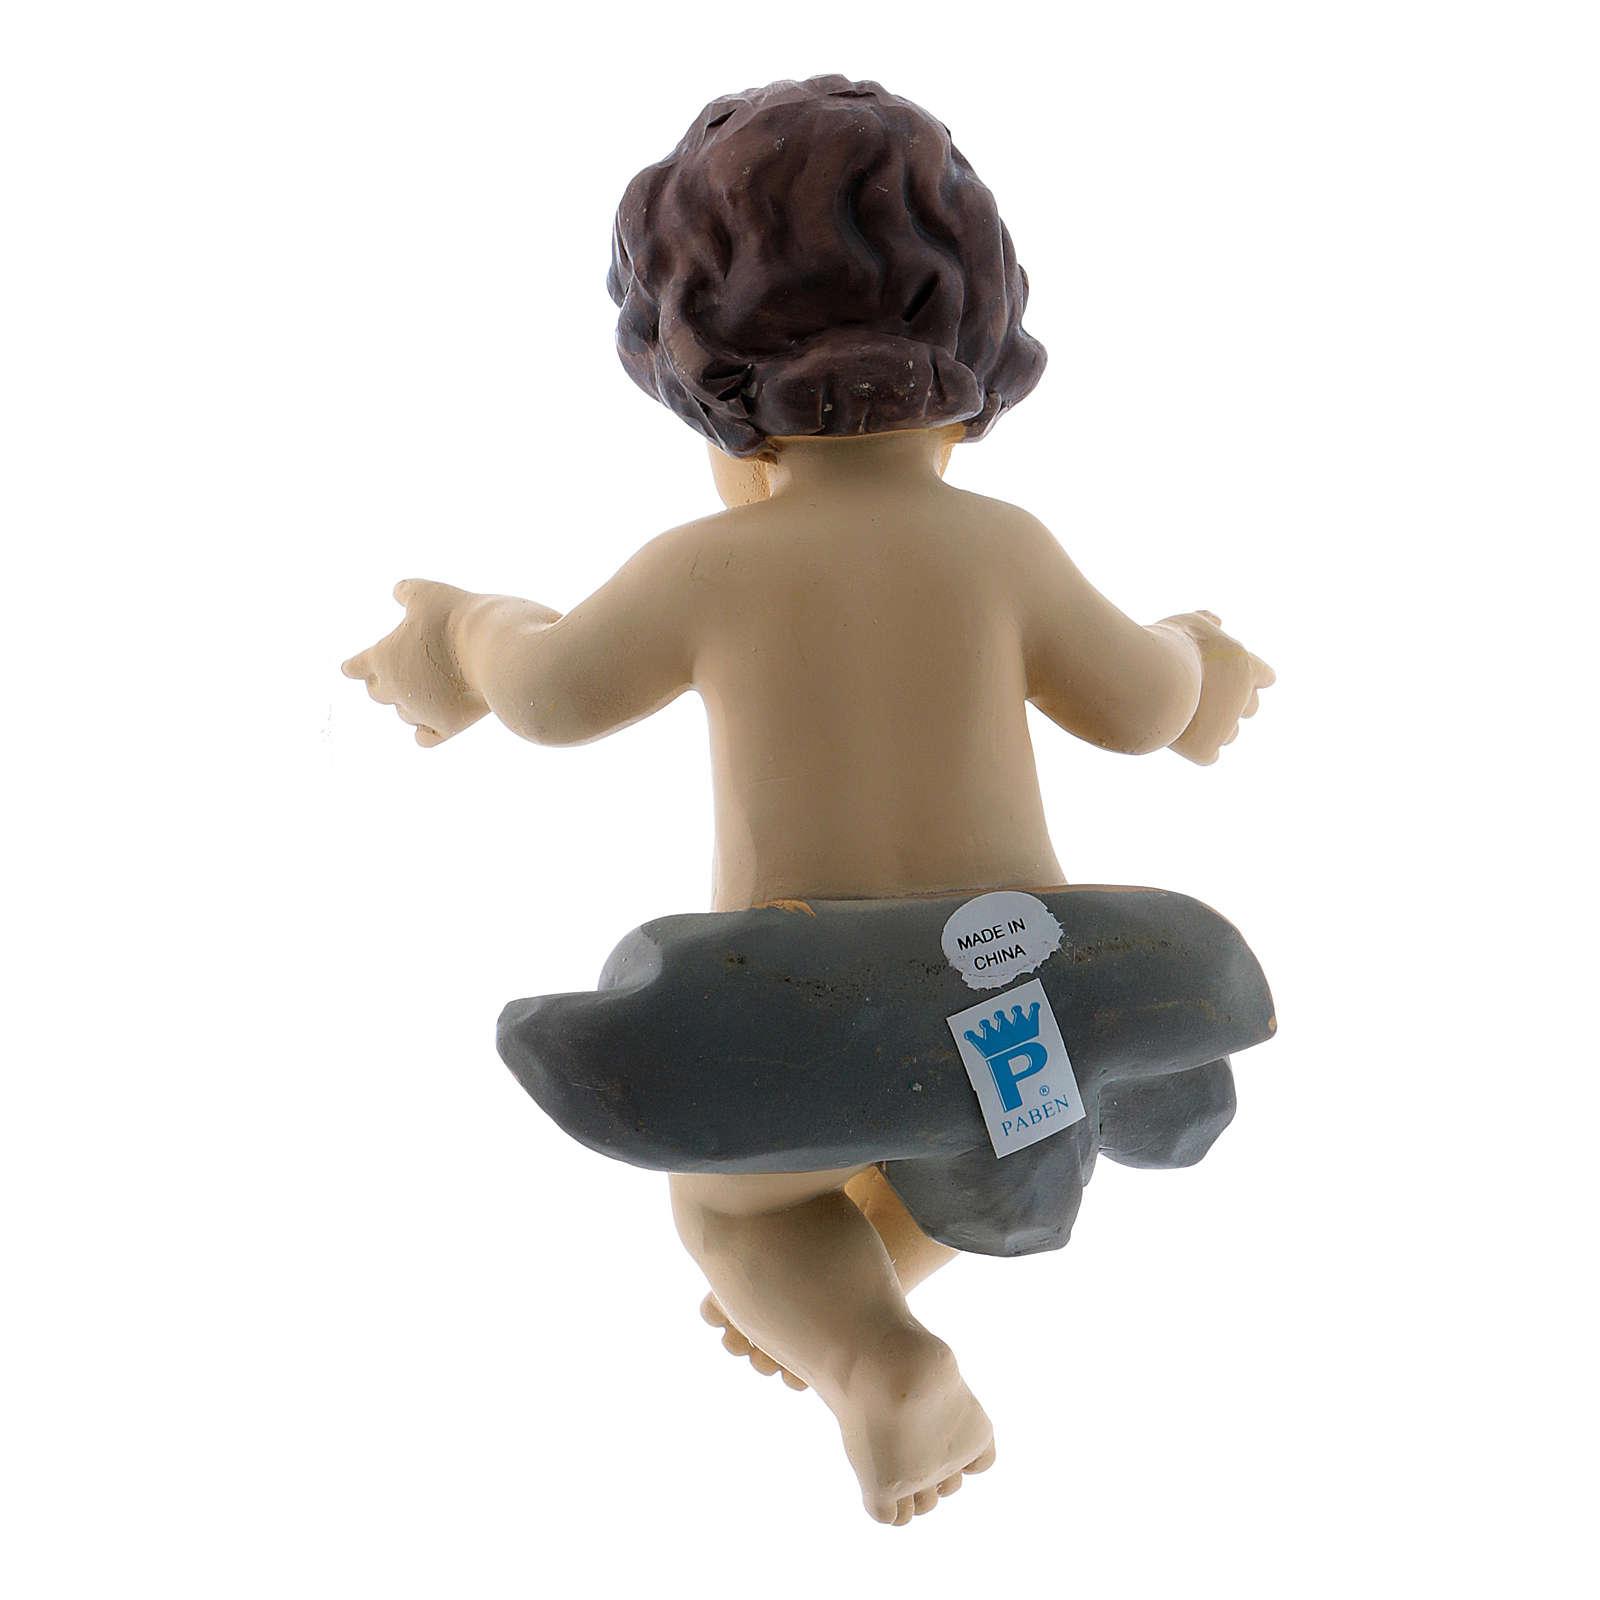 Baby Jesus statue sized 10 cm 3